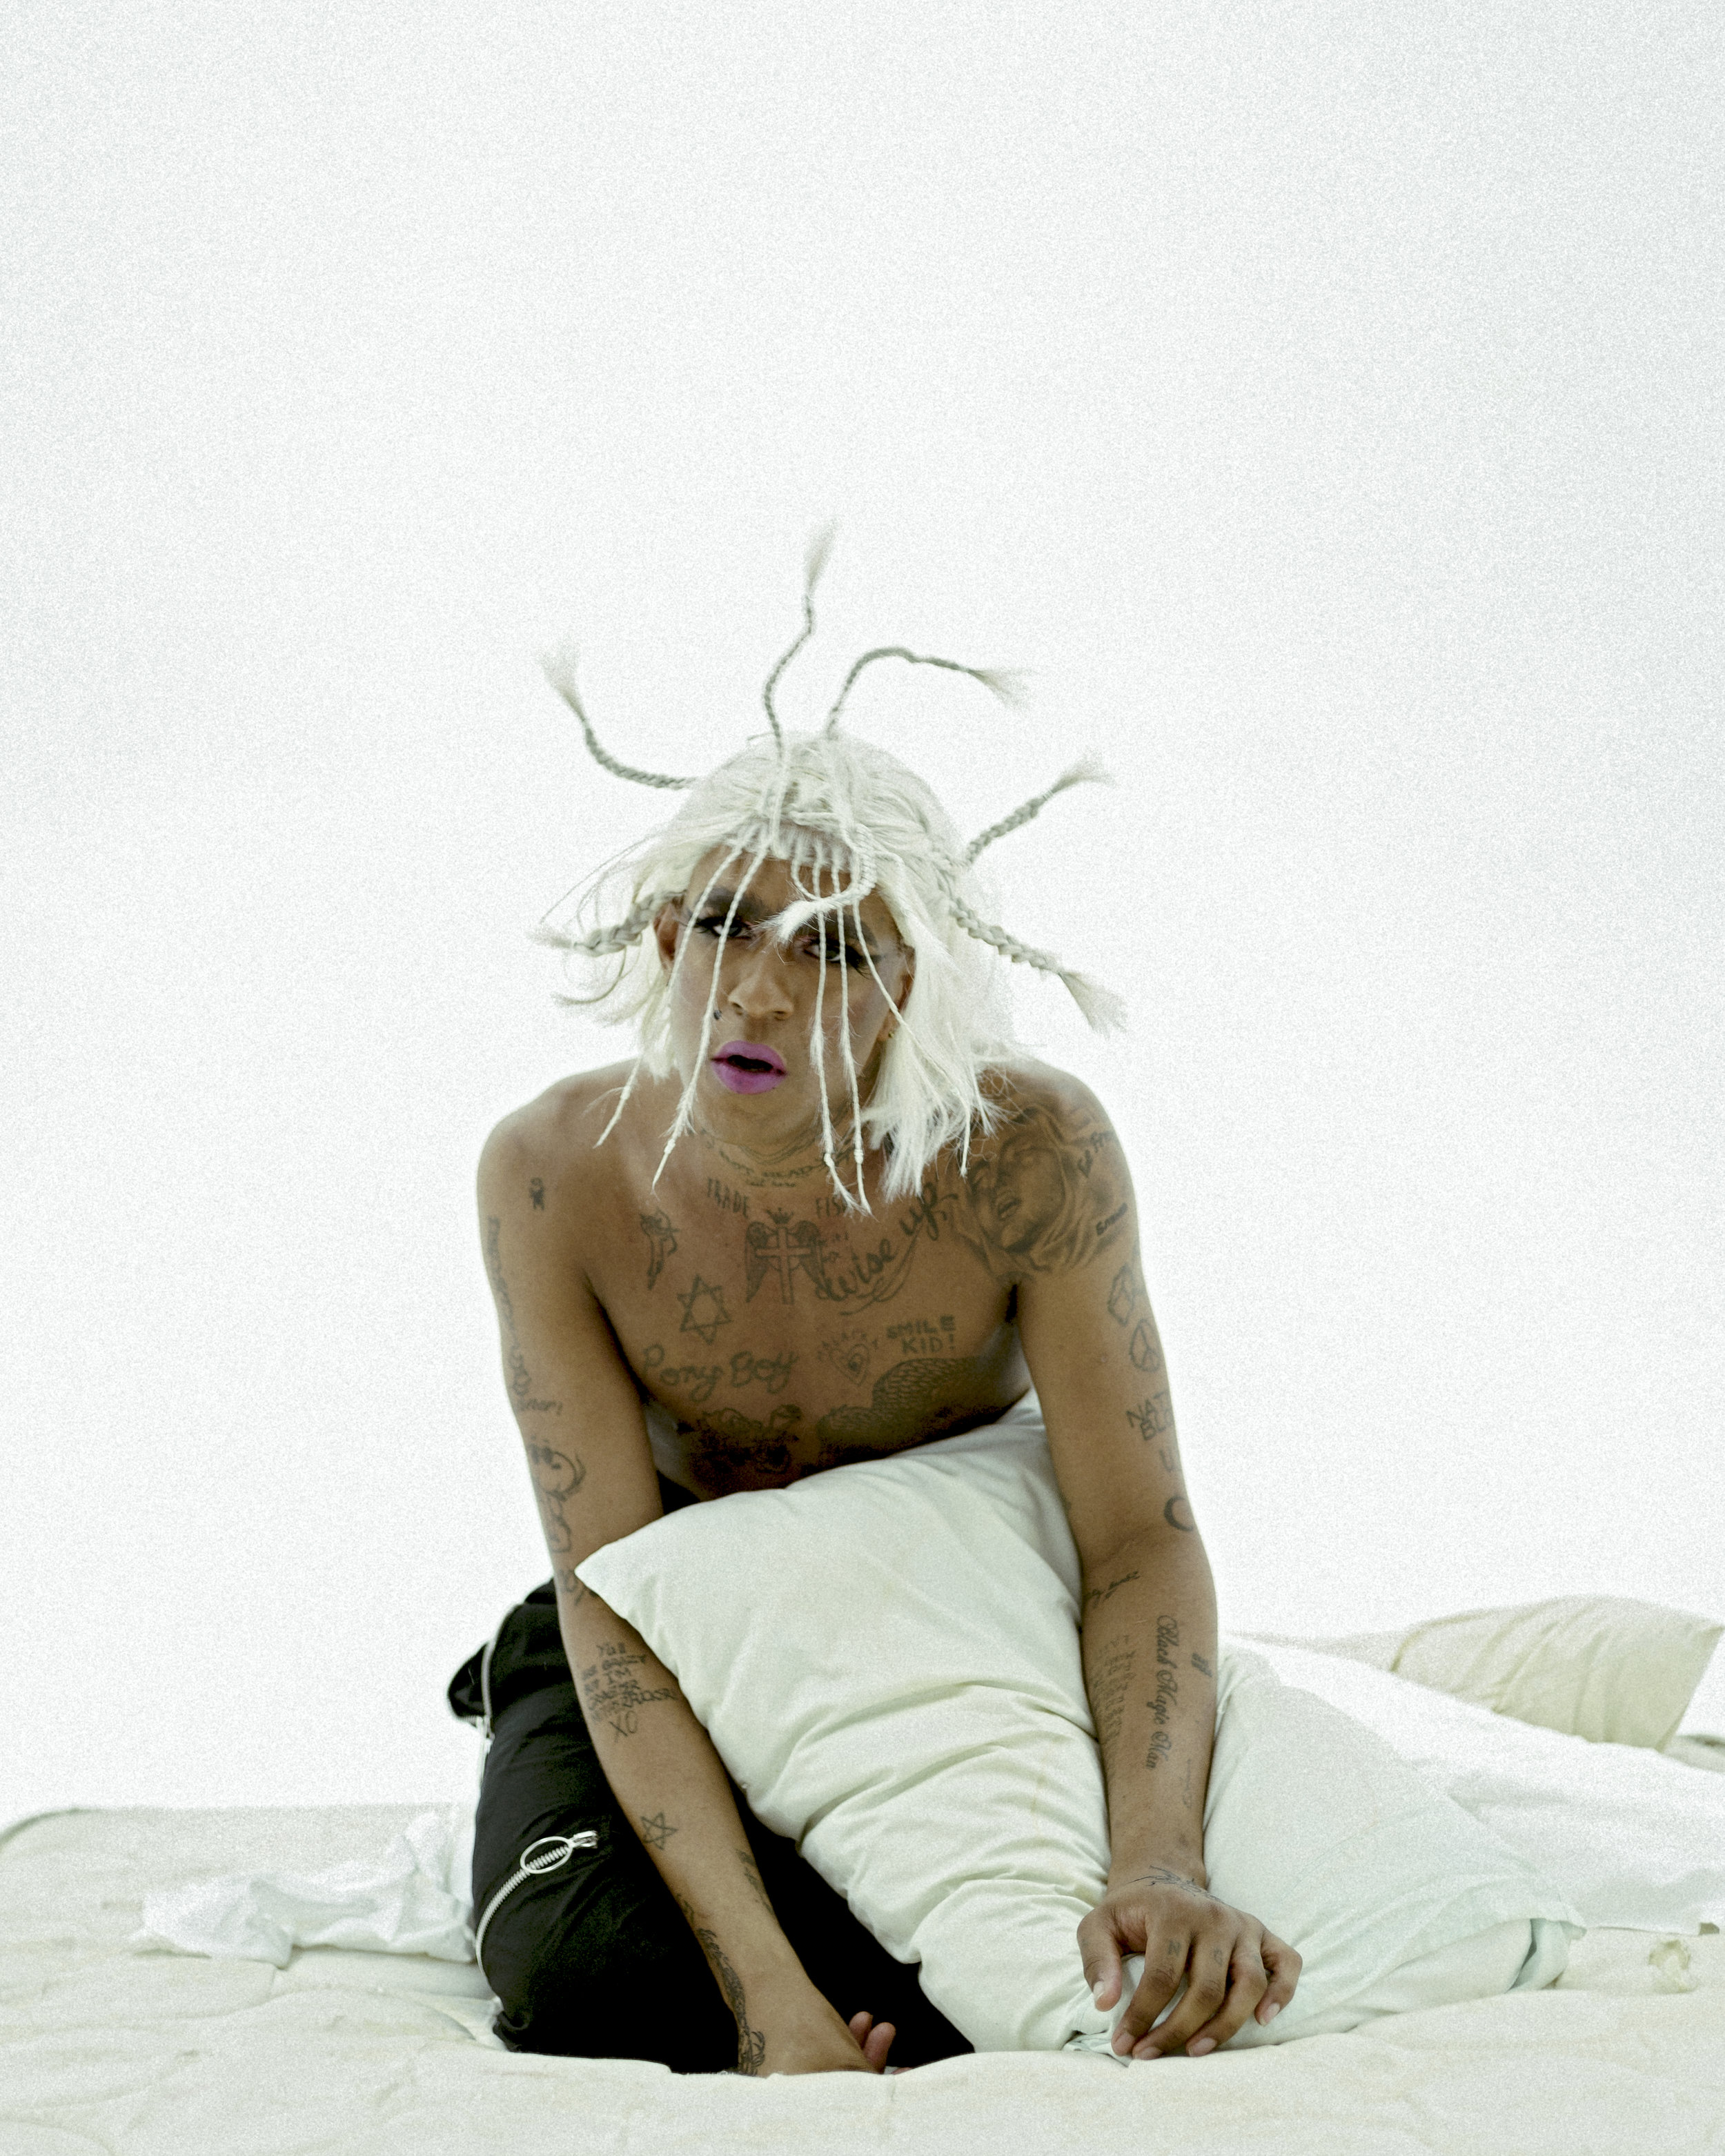 MYKKI - LONER BTS 1 - CREDIT SCOTT KAPLAN.jpg